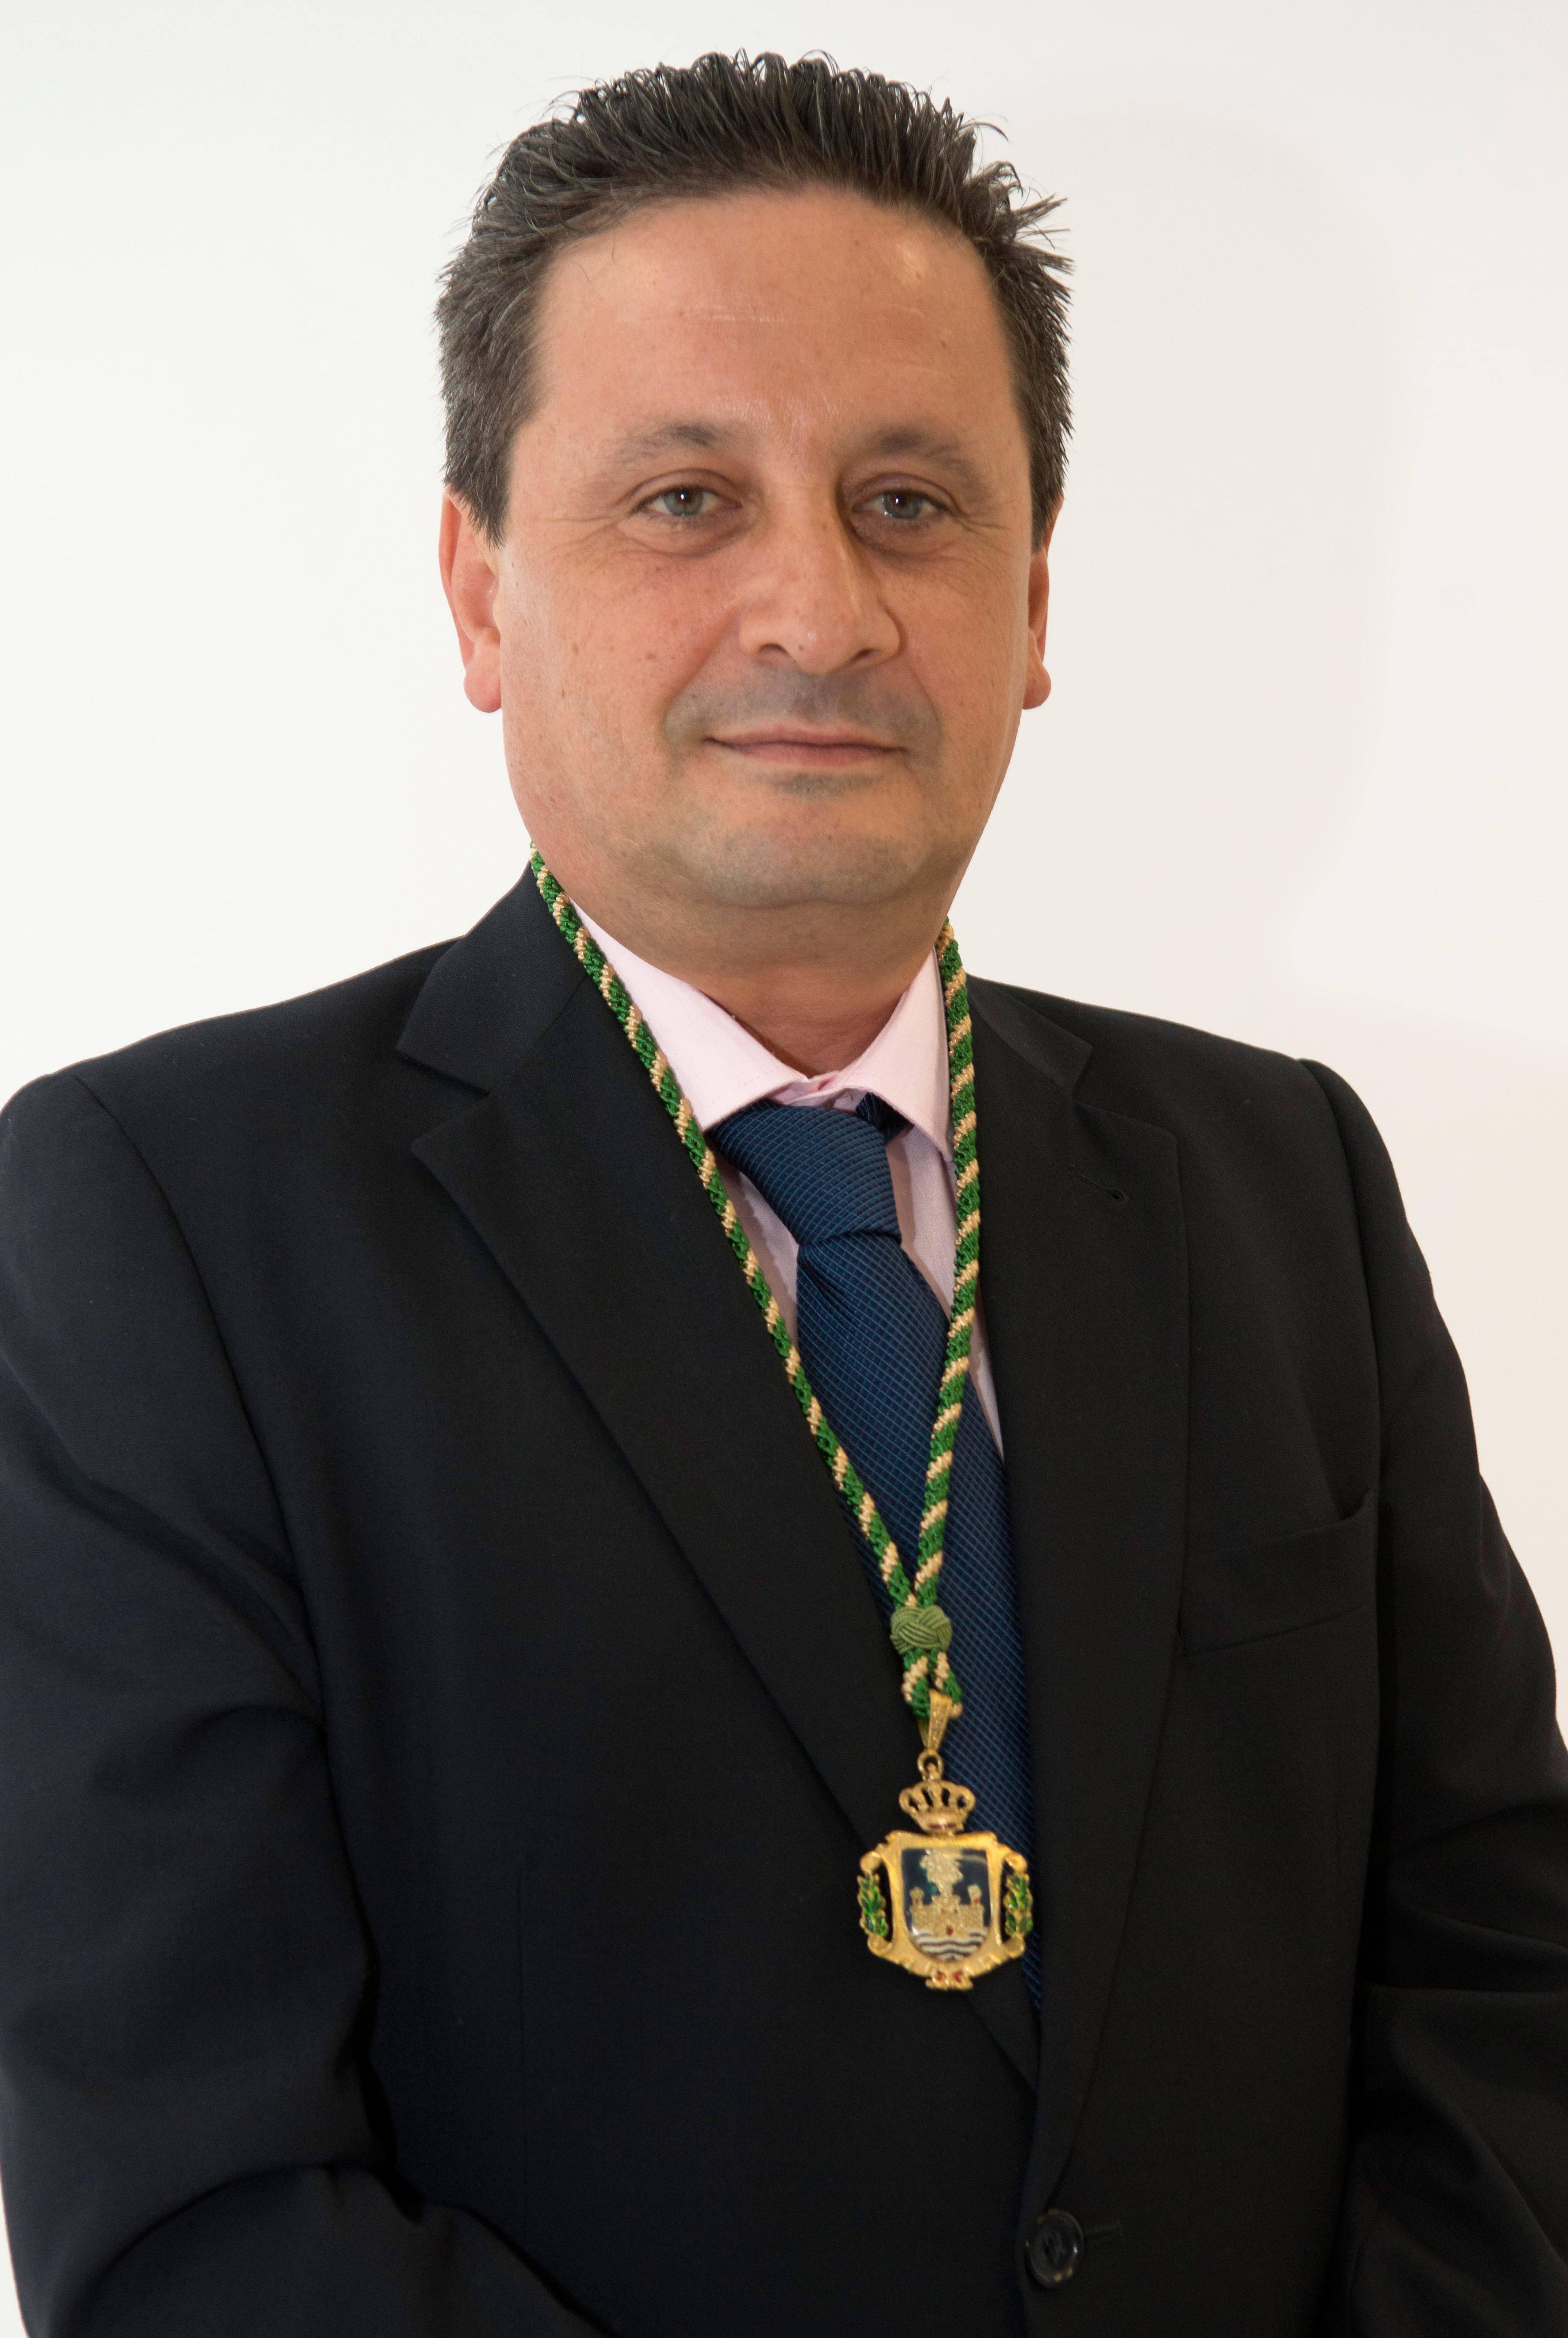 Juan Carlos Sanz Martín